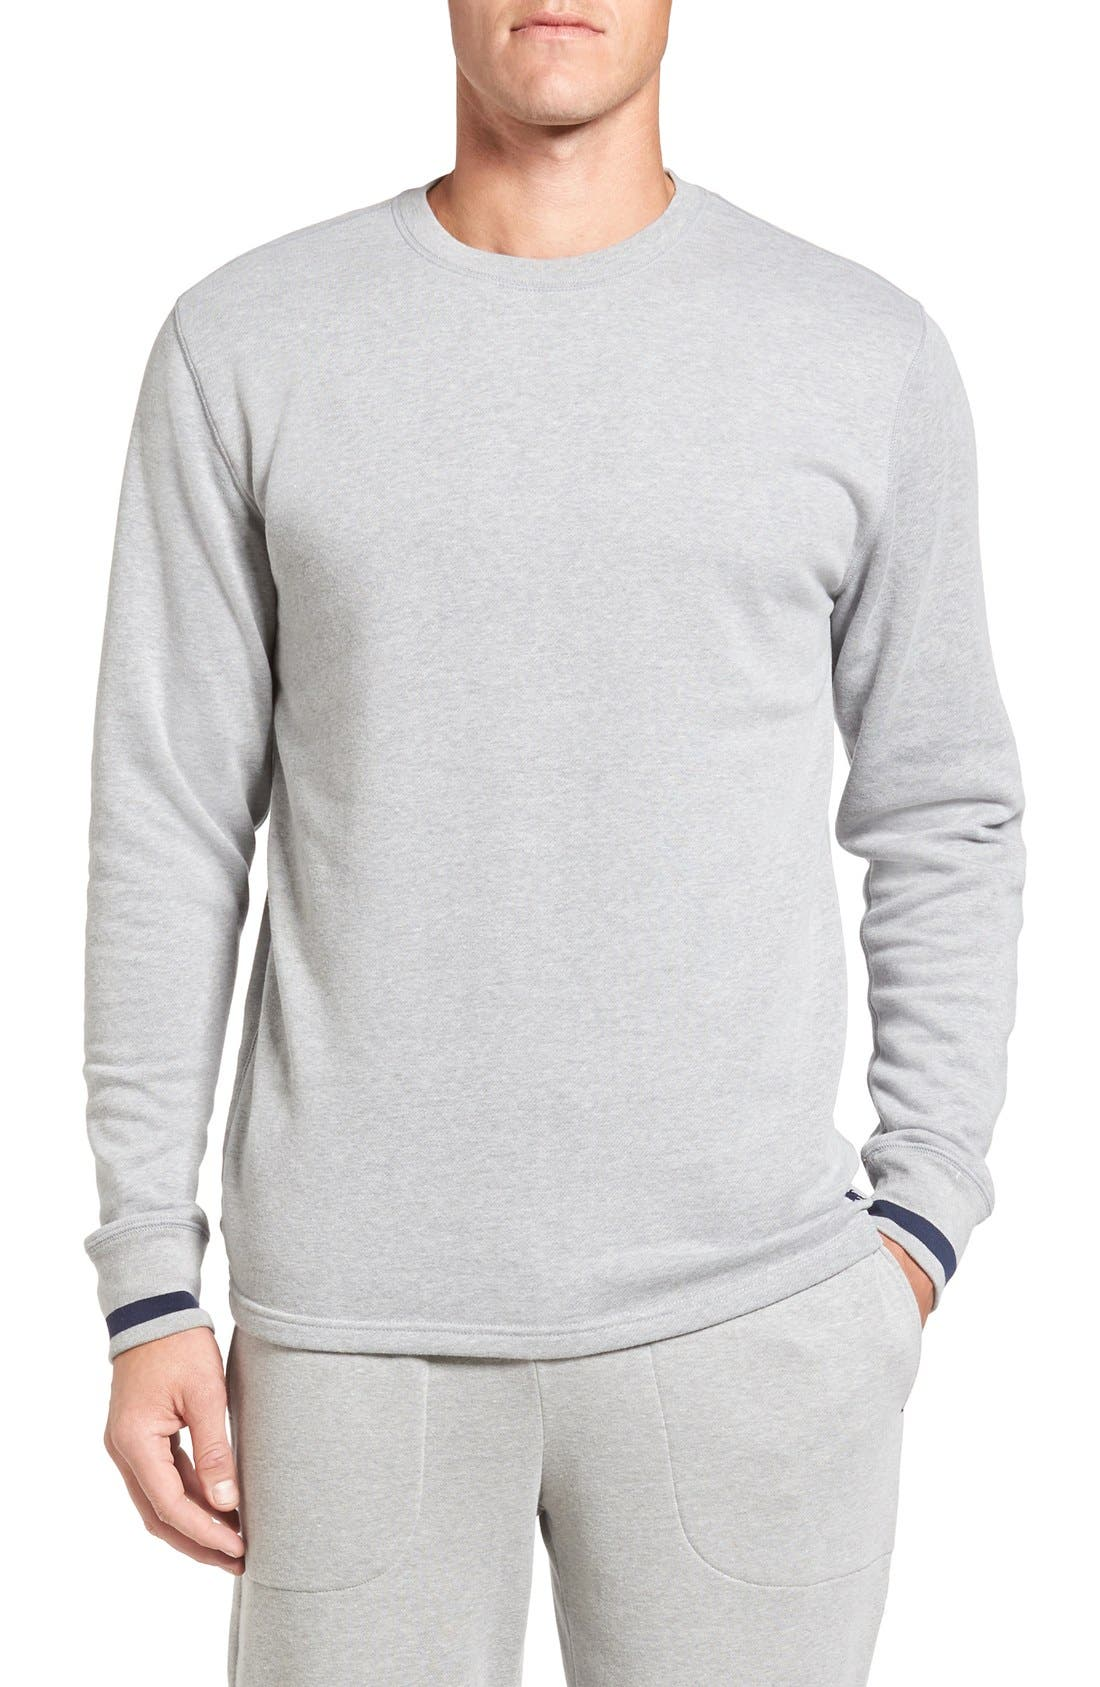 Brushed Jersey Cotton Blend Crewneck Sweatshirt,                         Main,                         color, Andover Heather Grey